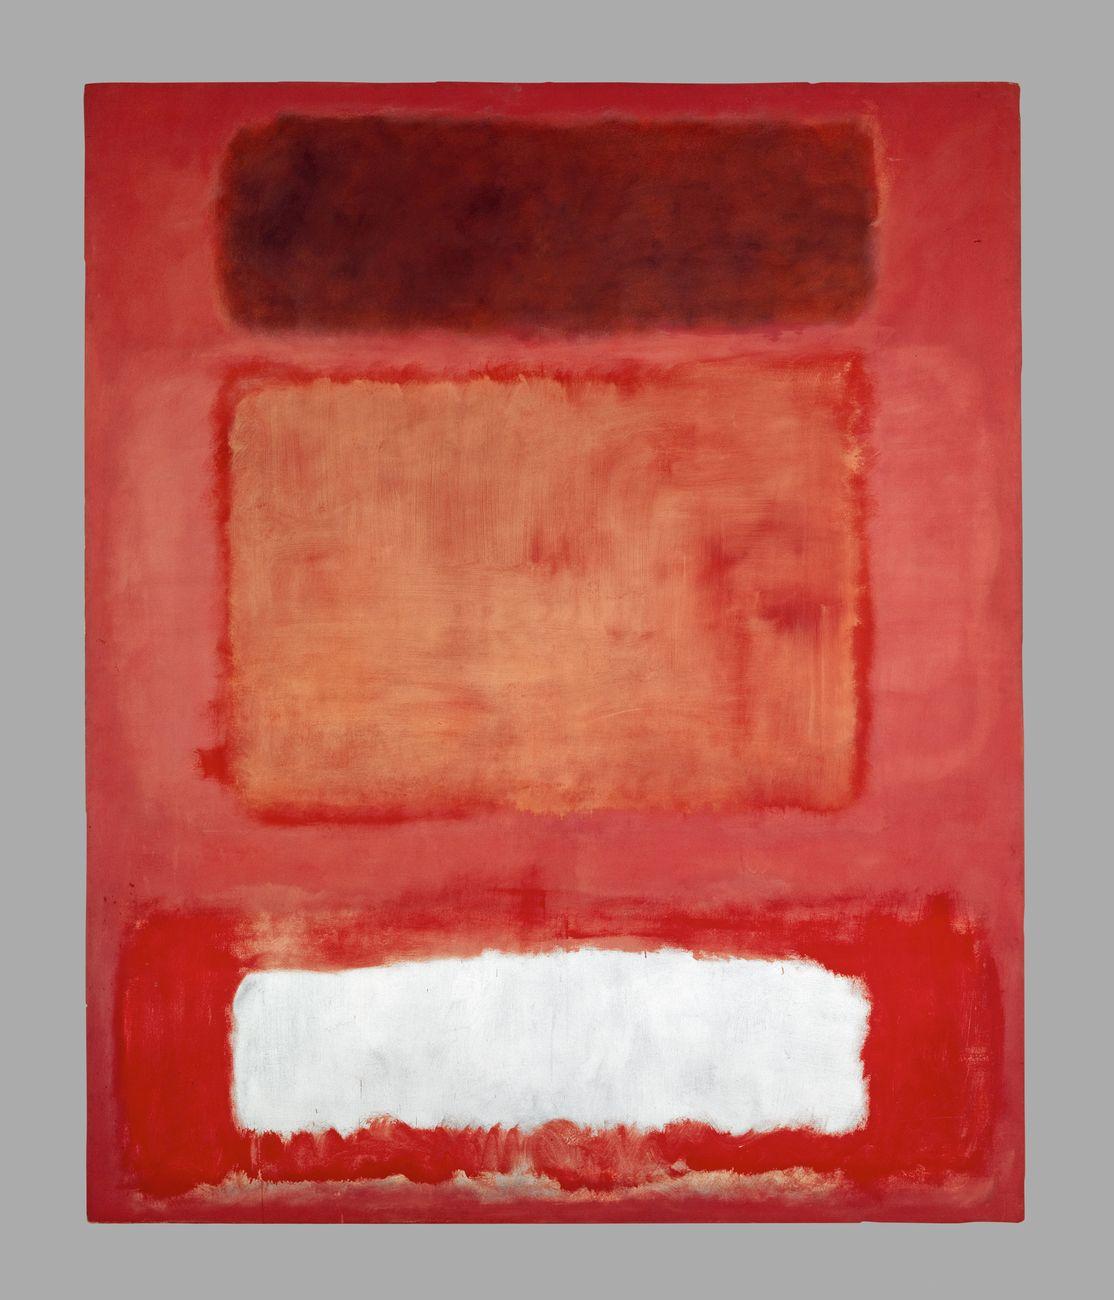 Mark Rothko, No. 16 – Red, White and Brown, 1957 © 1998 Kate Rothko Prizel & Christopher Rothko_Bildrecht, Wien, 2019. Photo © Kunstmuseum Basel